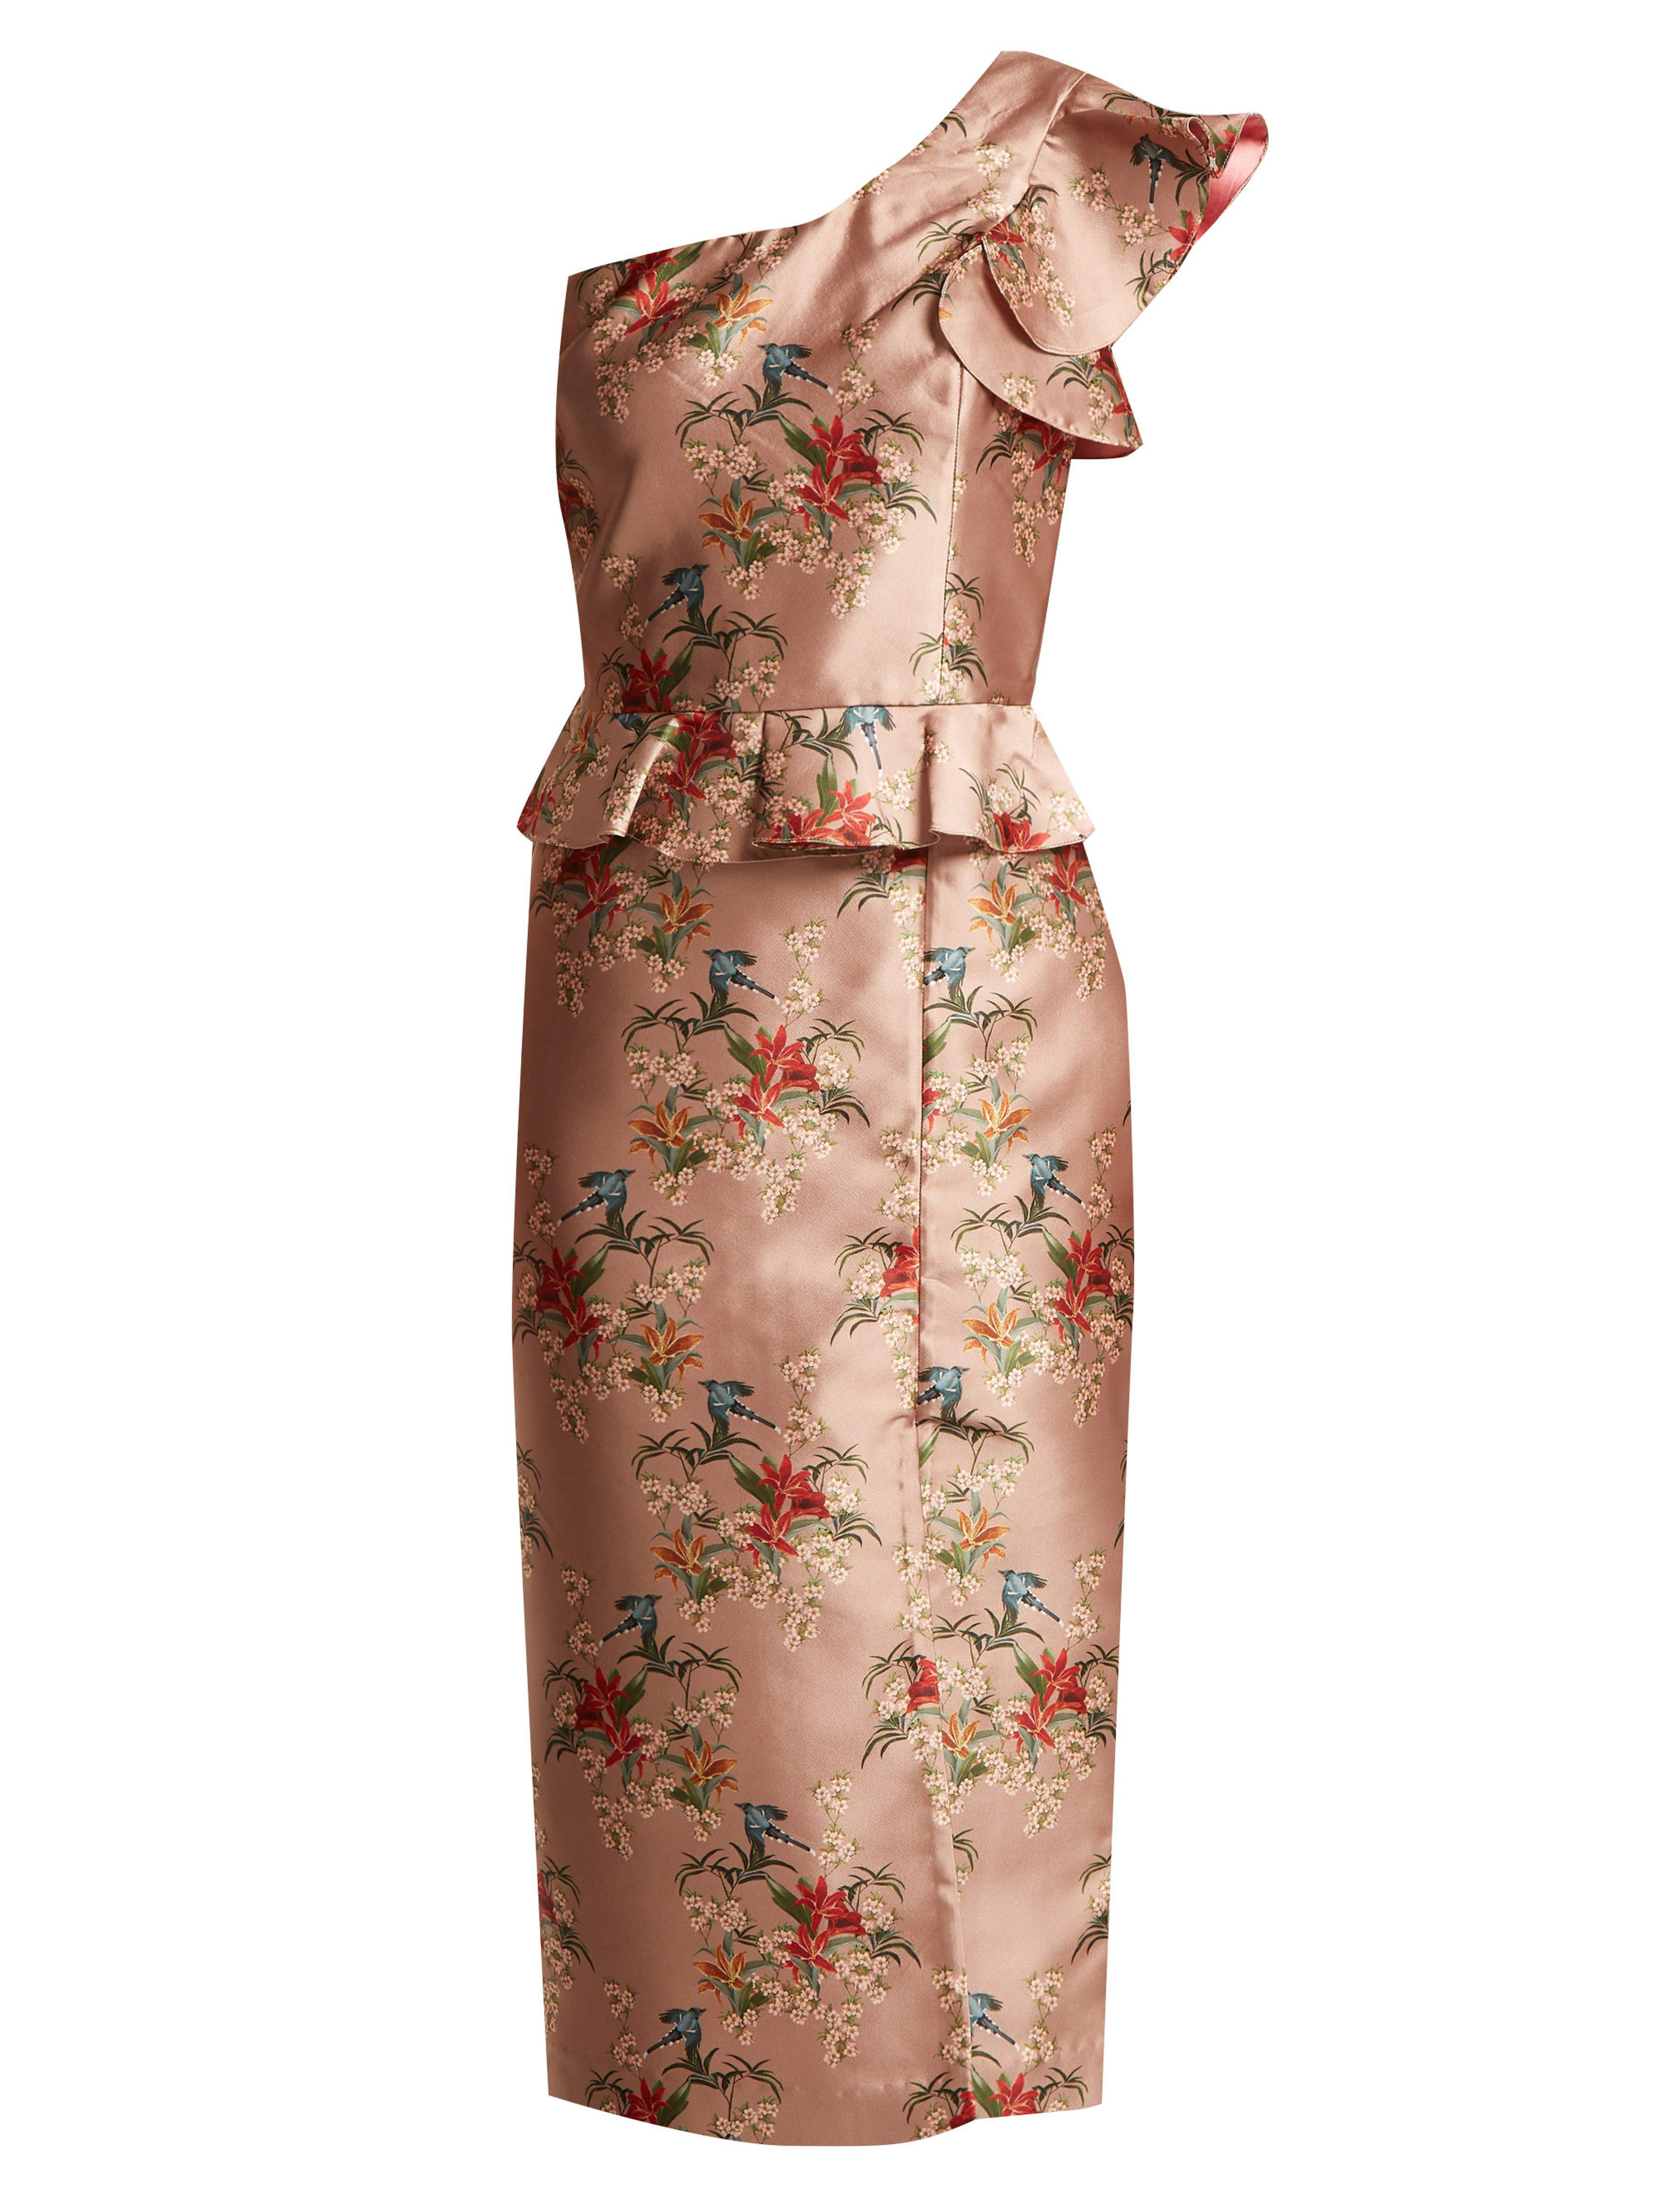 2a229d55a8ef4 Johanna Ortiz La Divinidad Asymmetric Satin Dress in Pink - Lyst